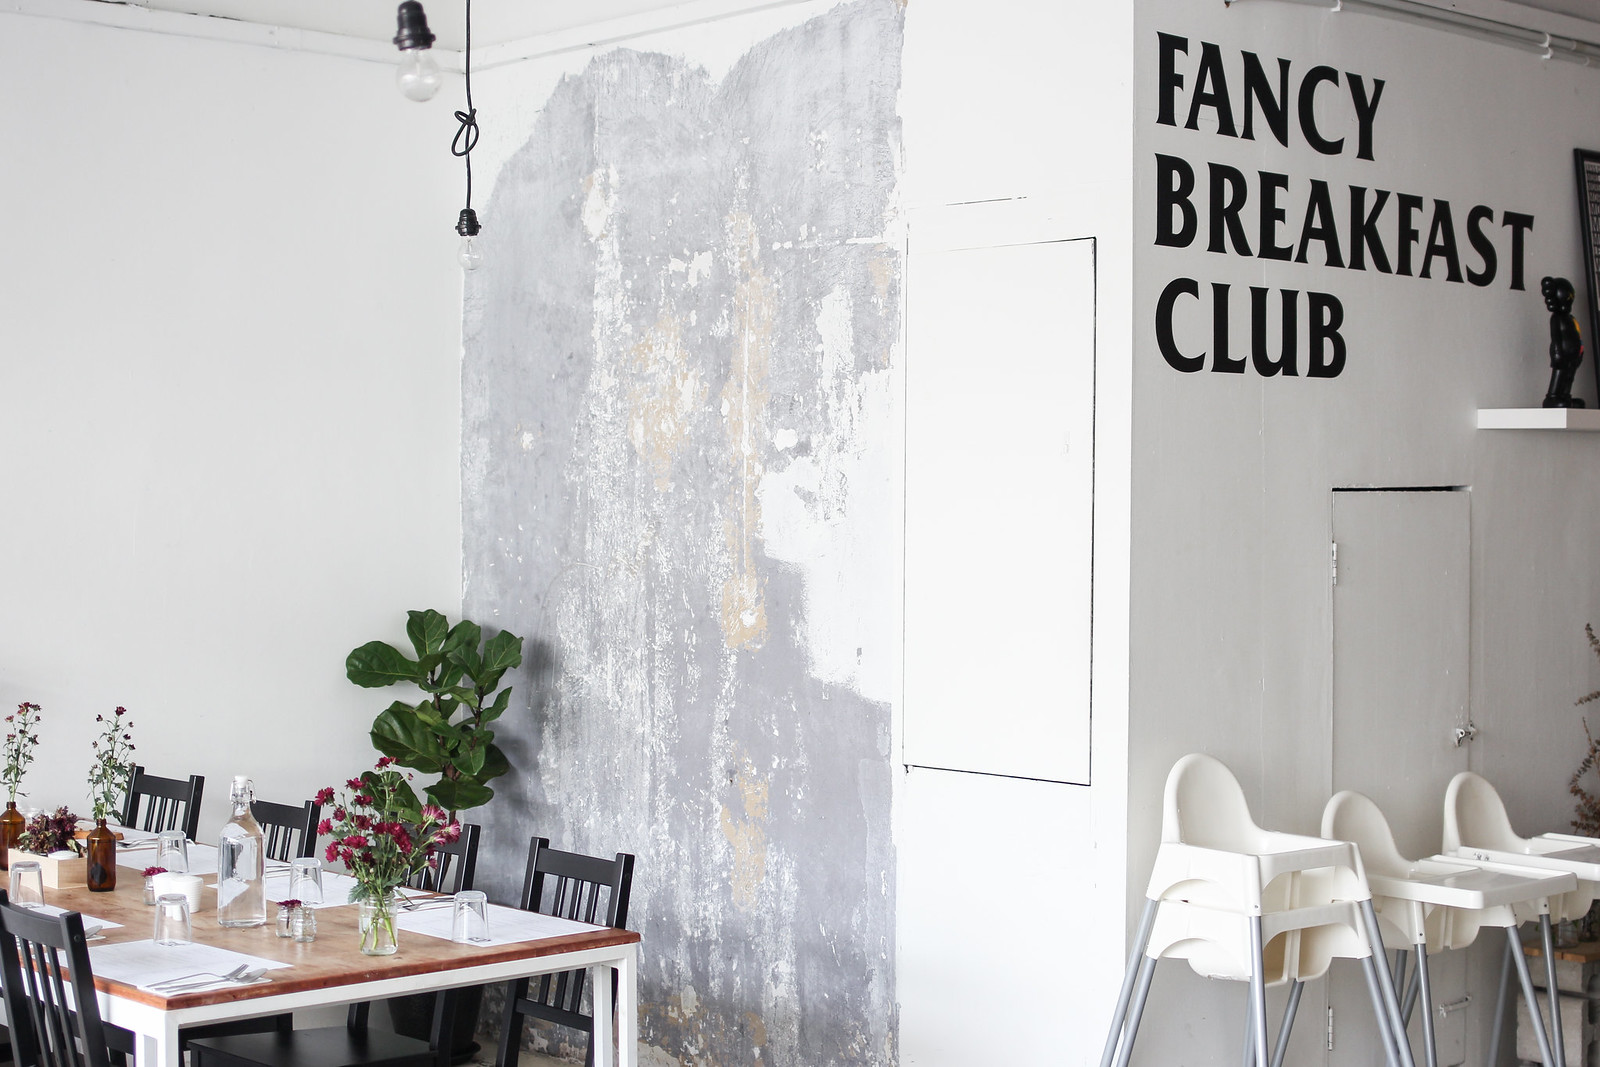 fancybreakfastclub7